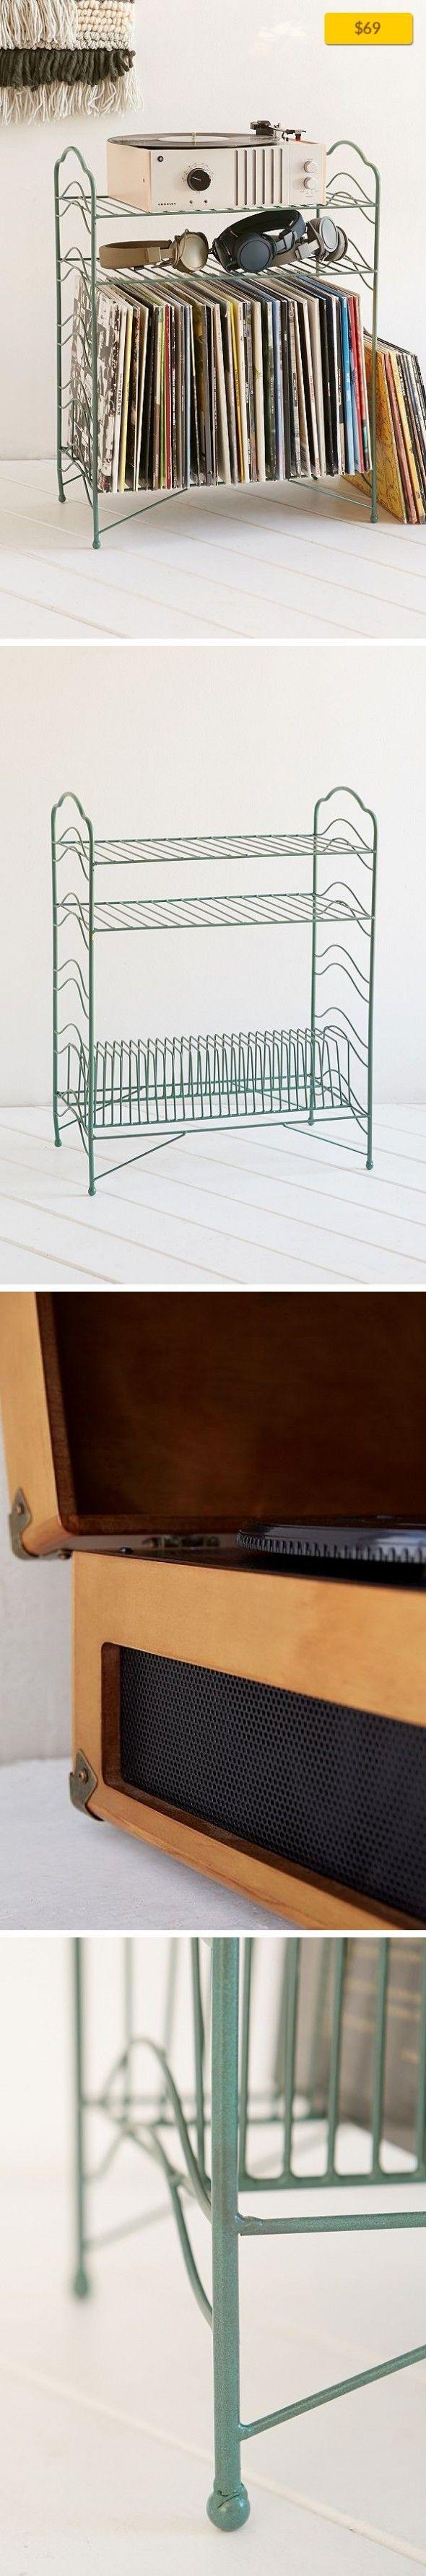 vinyl shelves boltz steel storage rack furniture shelf record lp